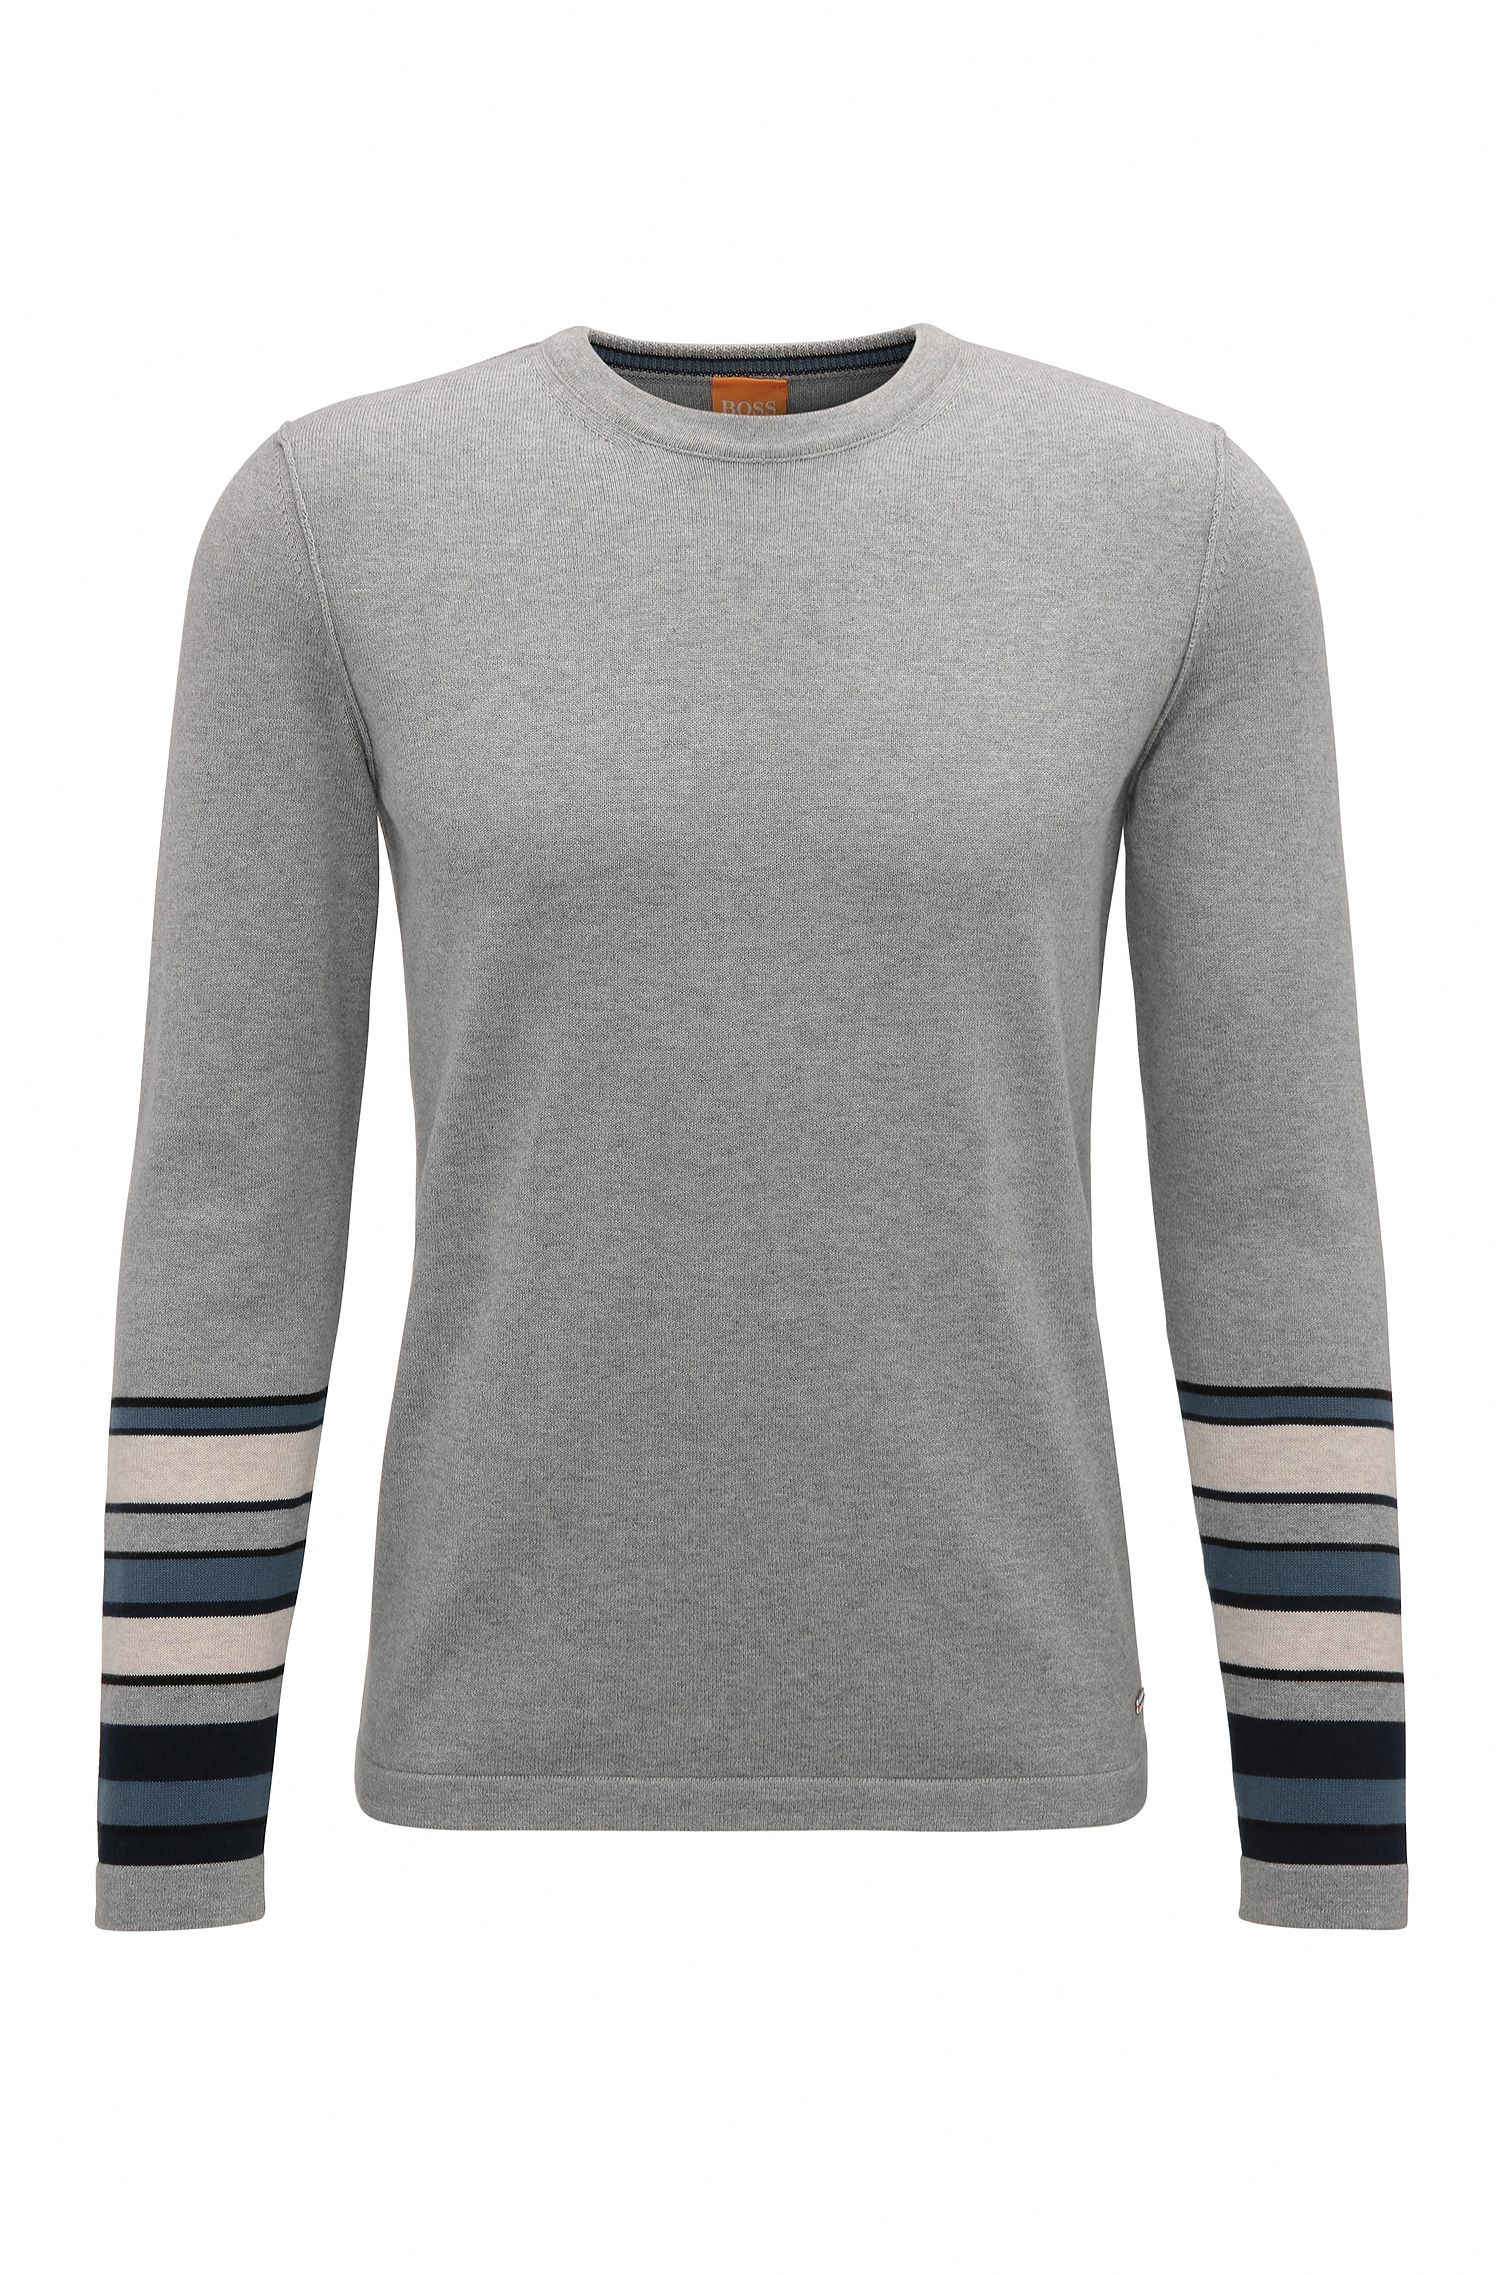 Block Stripe Cotton Sweater | Astrygan